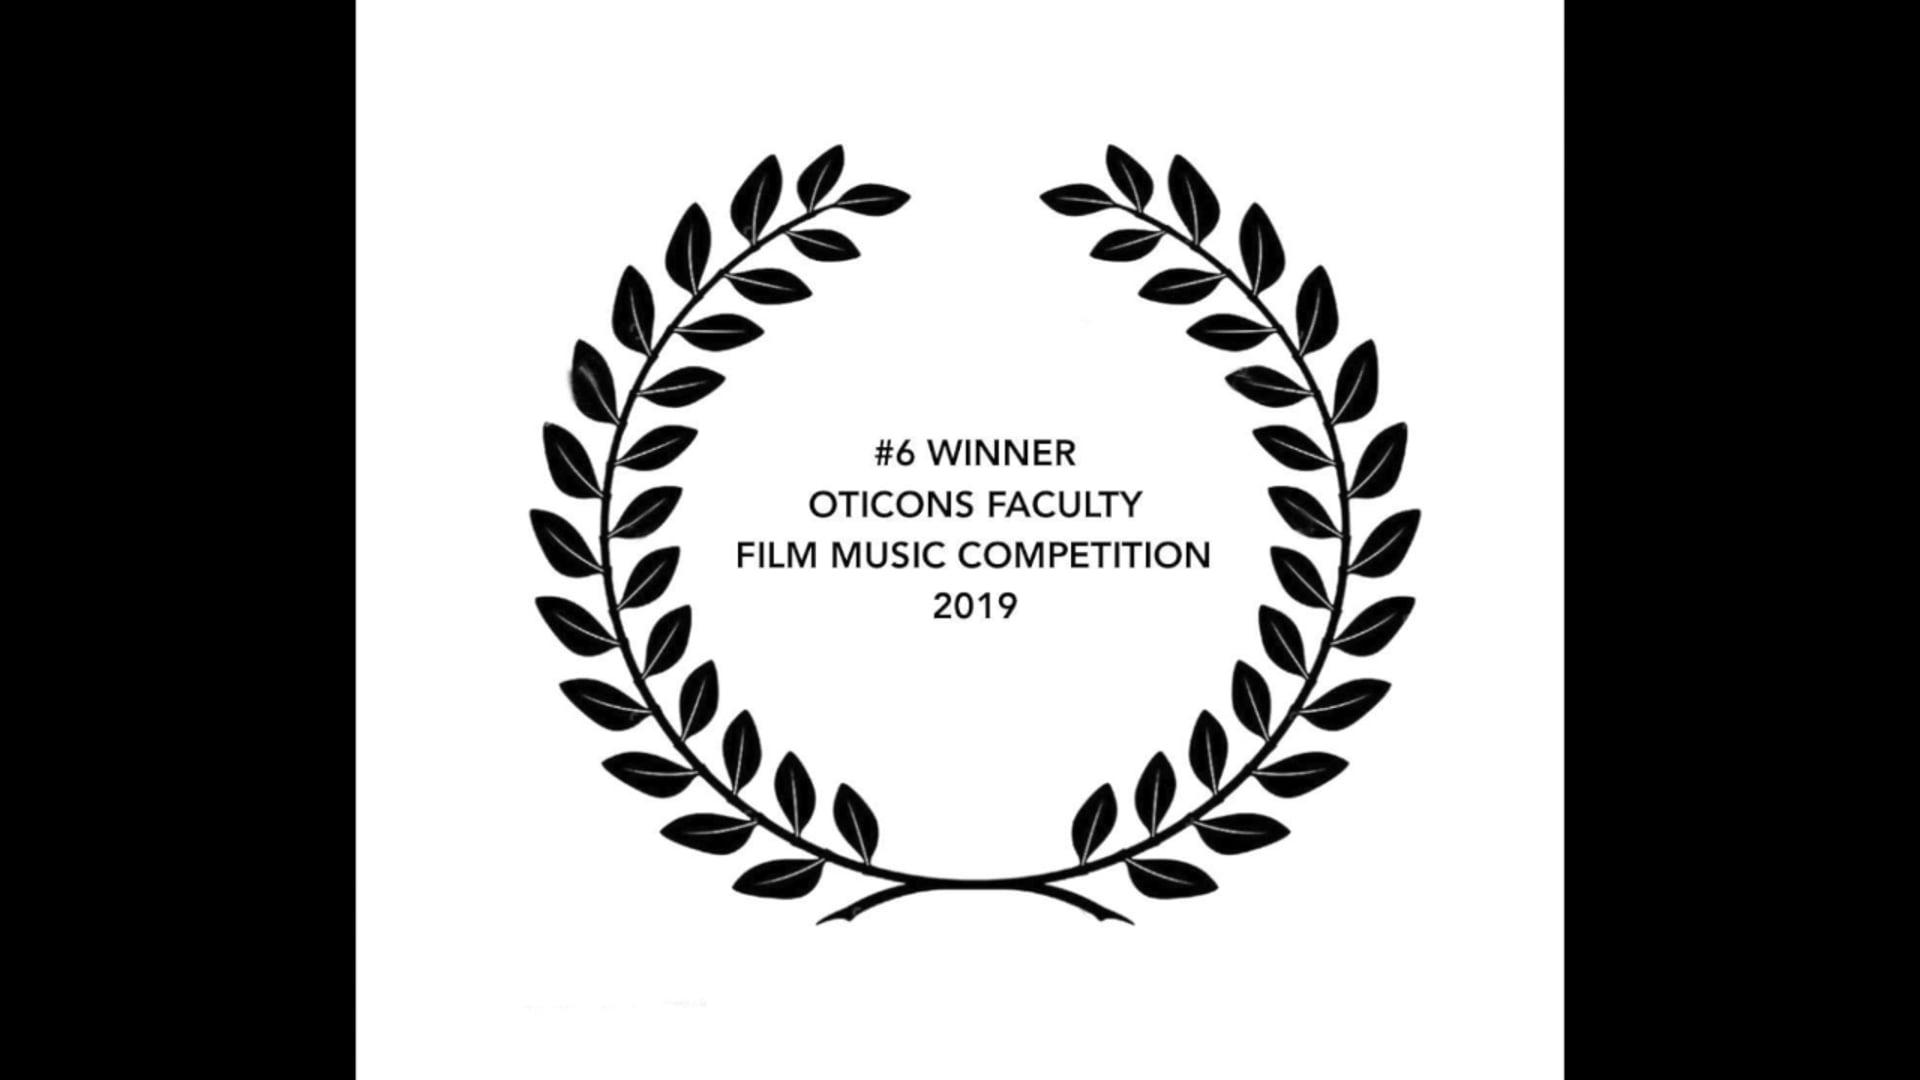 Oticons Faculty Score a Scene